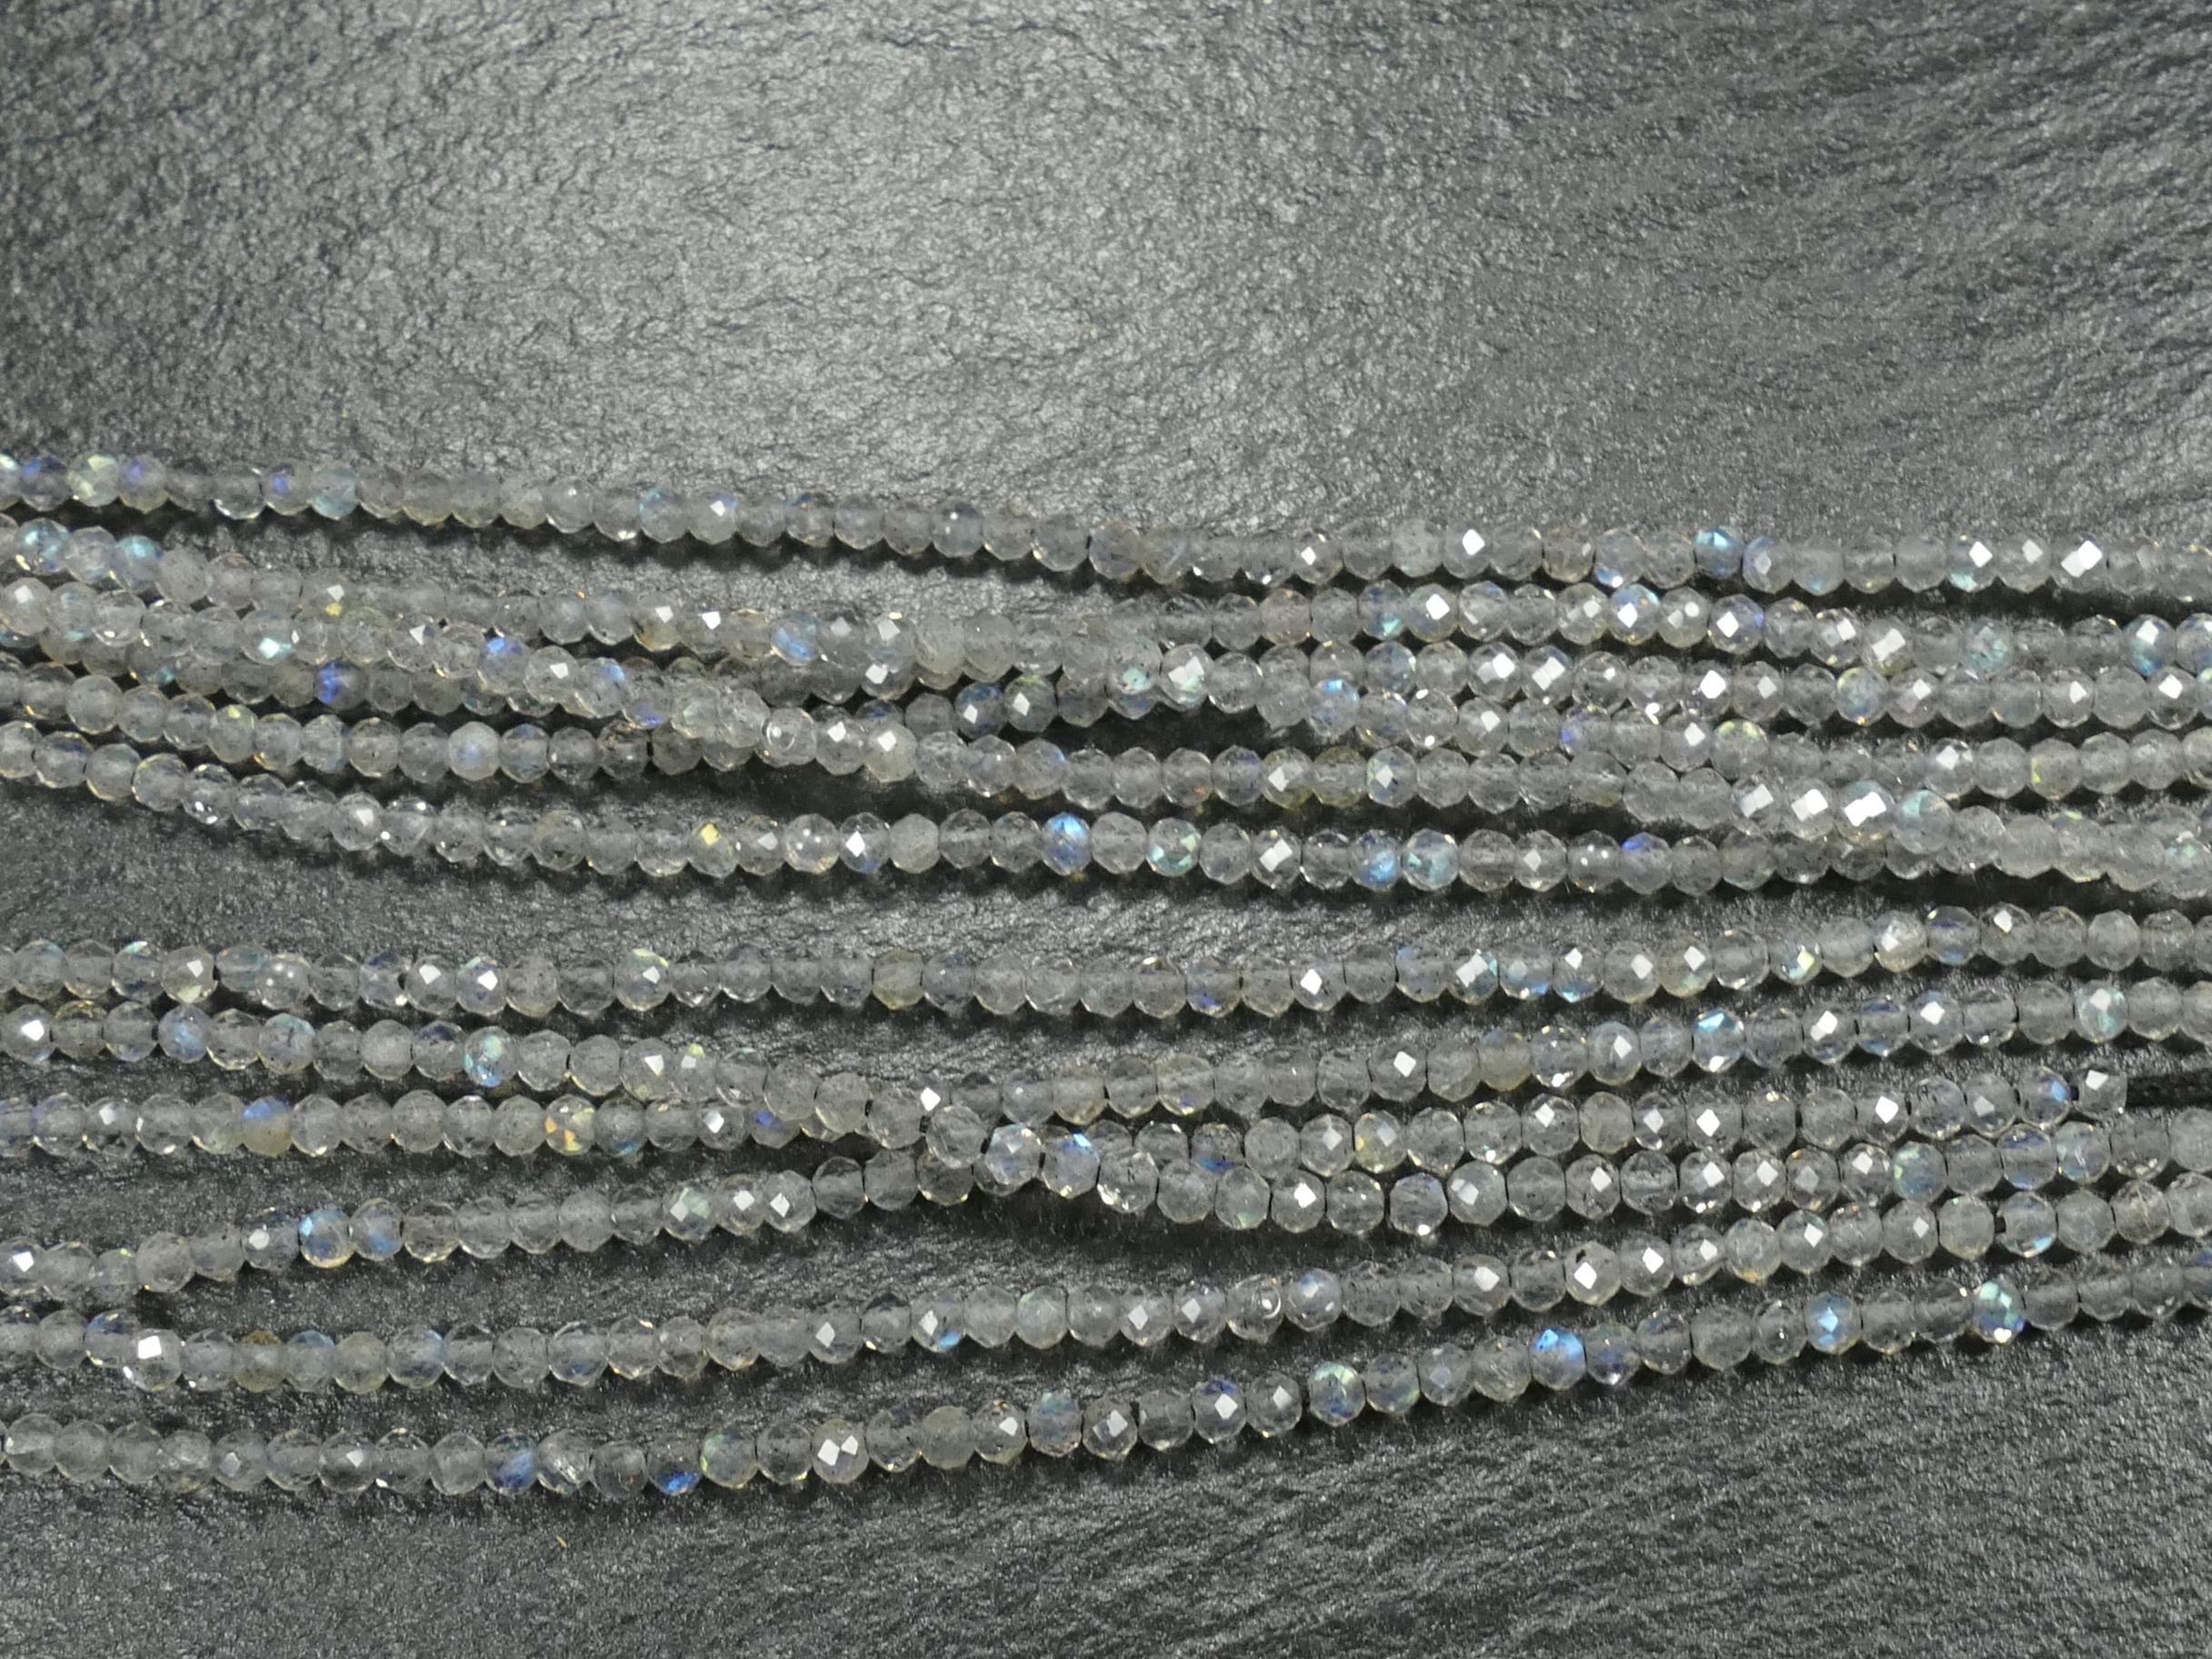 2mm AAA/AAA+ Labradorite naturelle en petite perle rondelle facetté Madagascar fil x15cm (5.9inch) (#AC853)